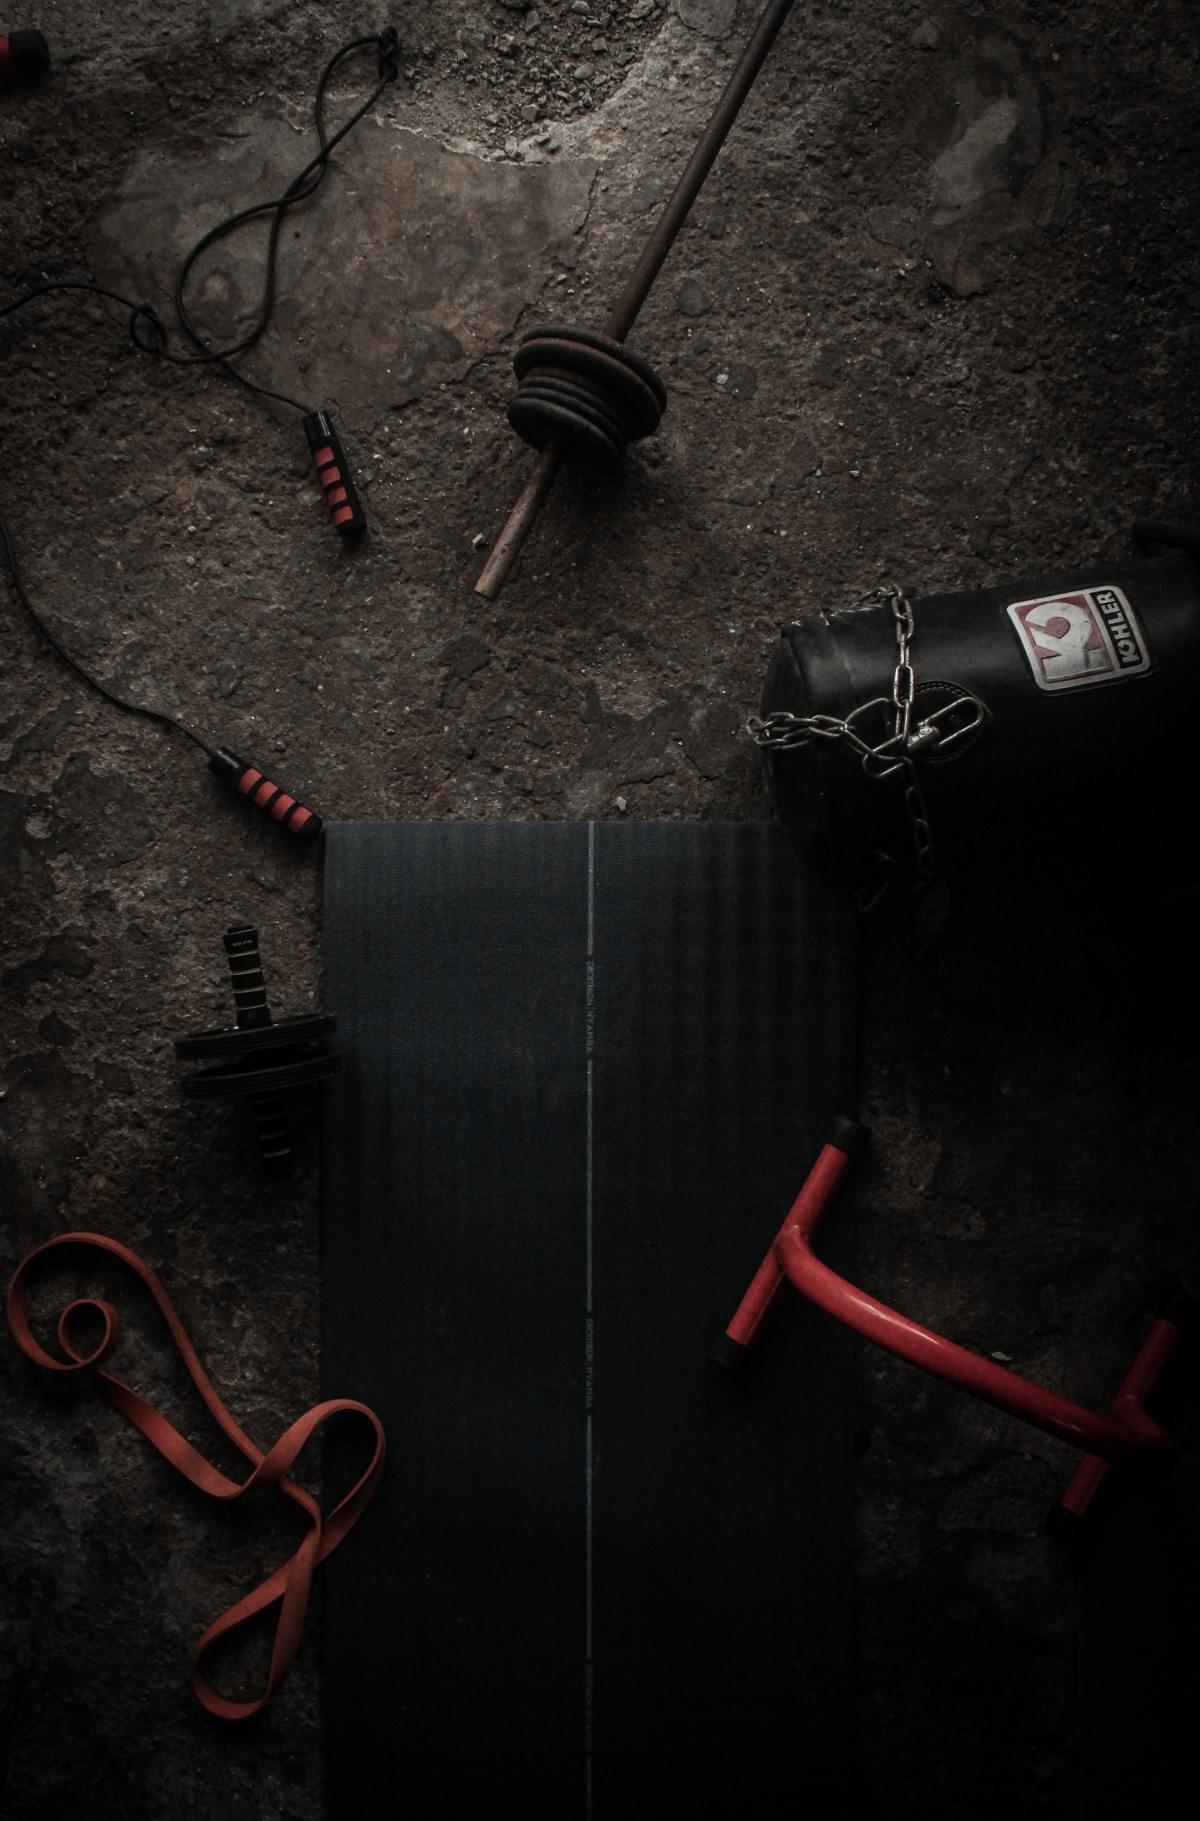 athomeworkoutequipment